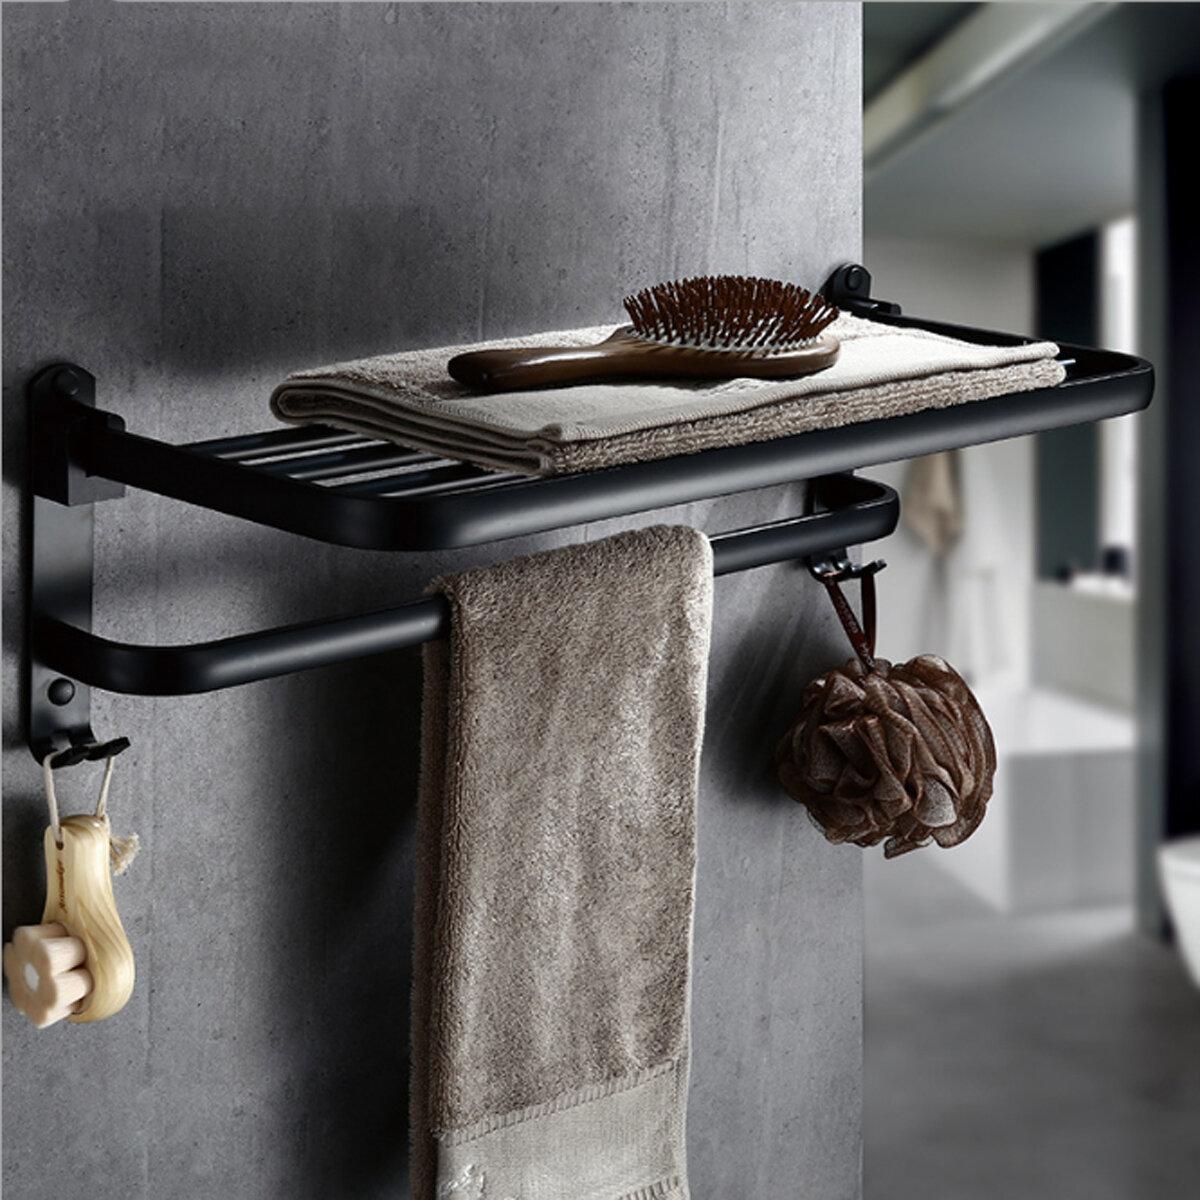 Foldable Vintage Towel Rack Black Brief Aluminum Folding Holder Double Bath Shelves Rail